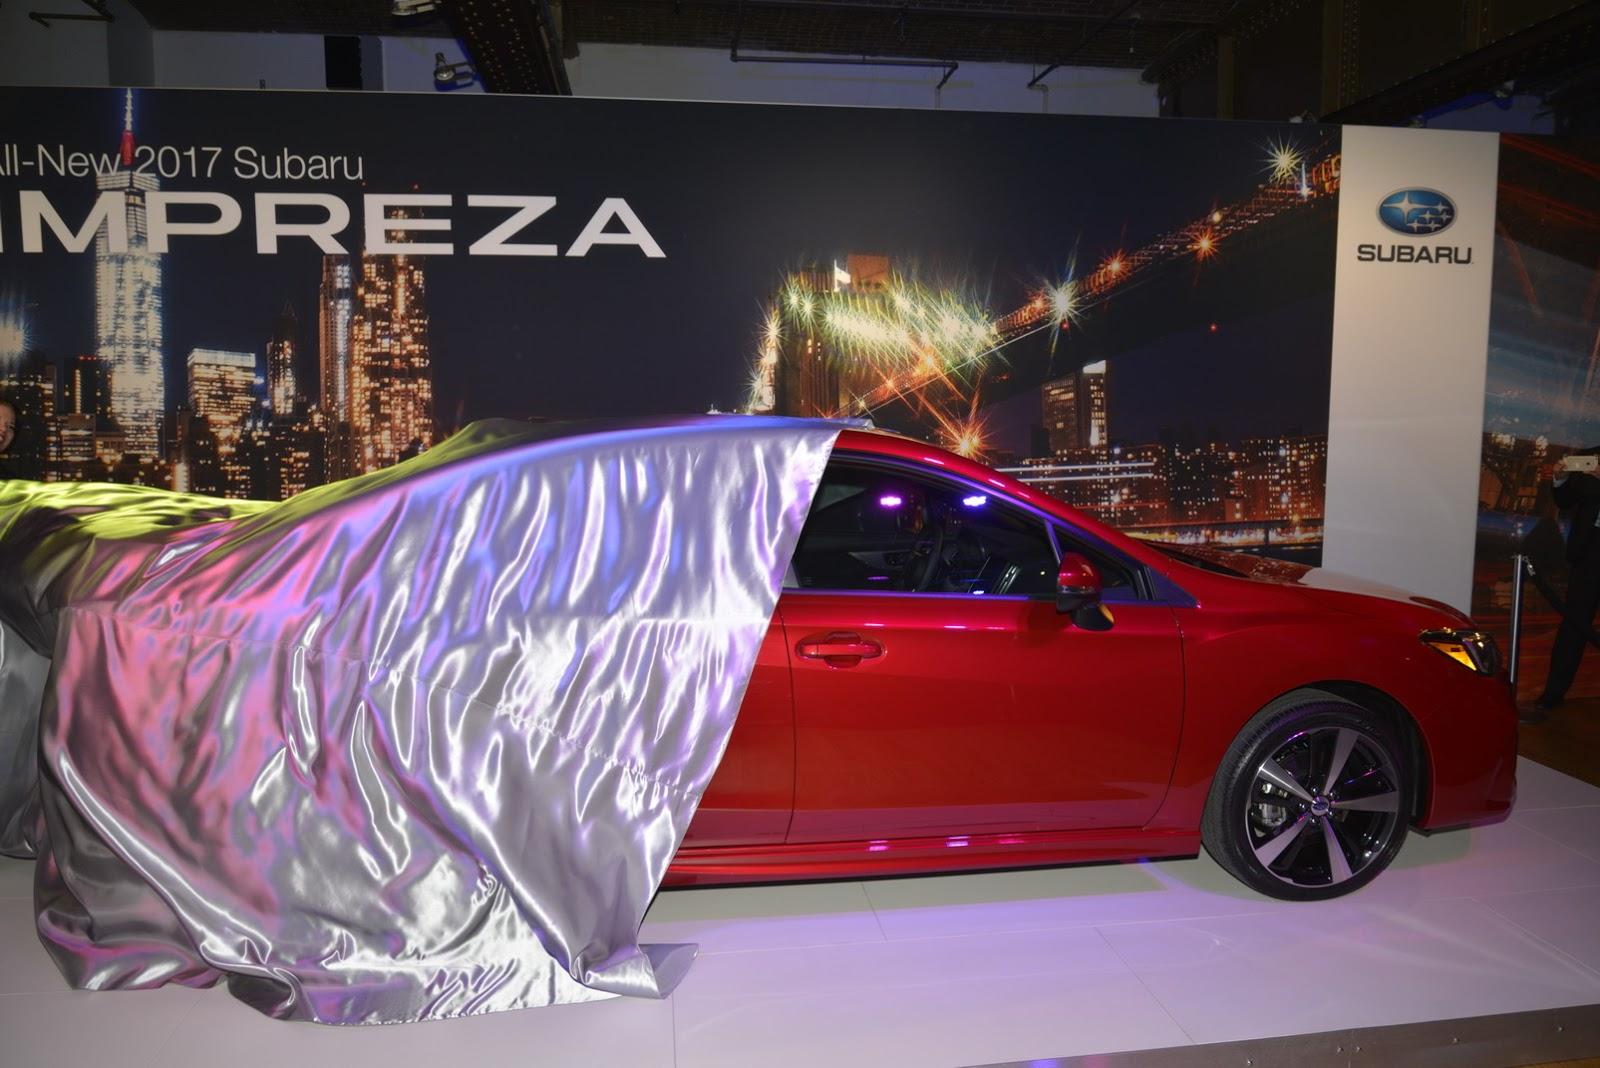 Cận cảnh Subaru Impreza 2017 tại New York Auto Show